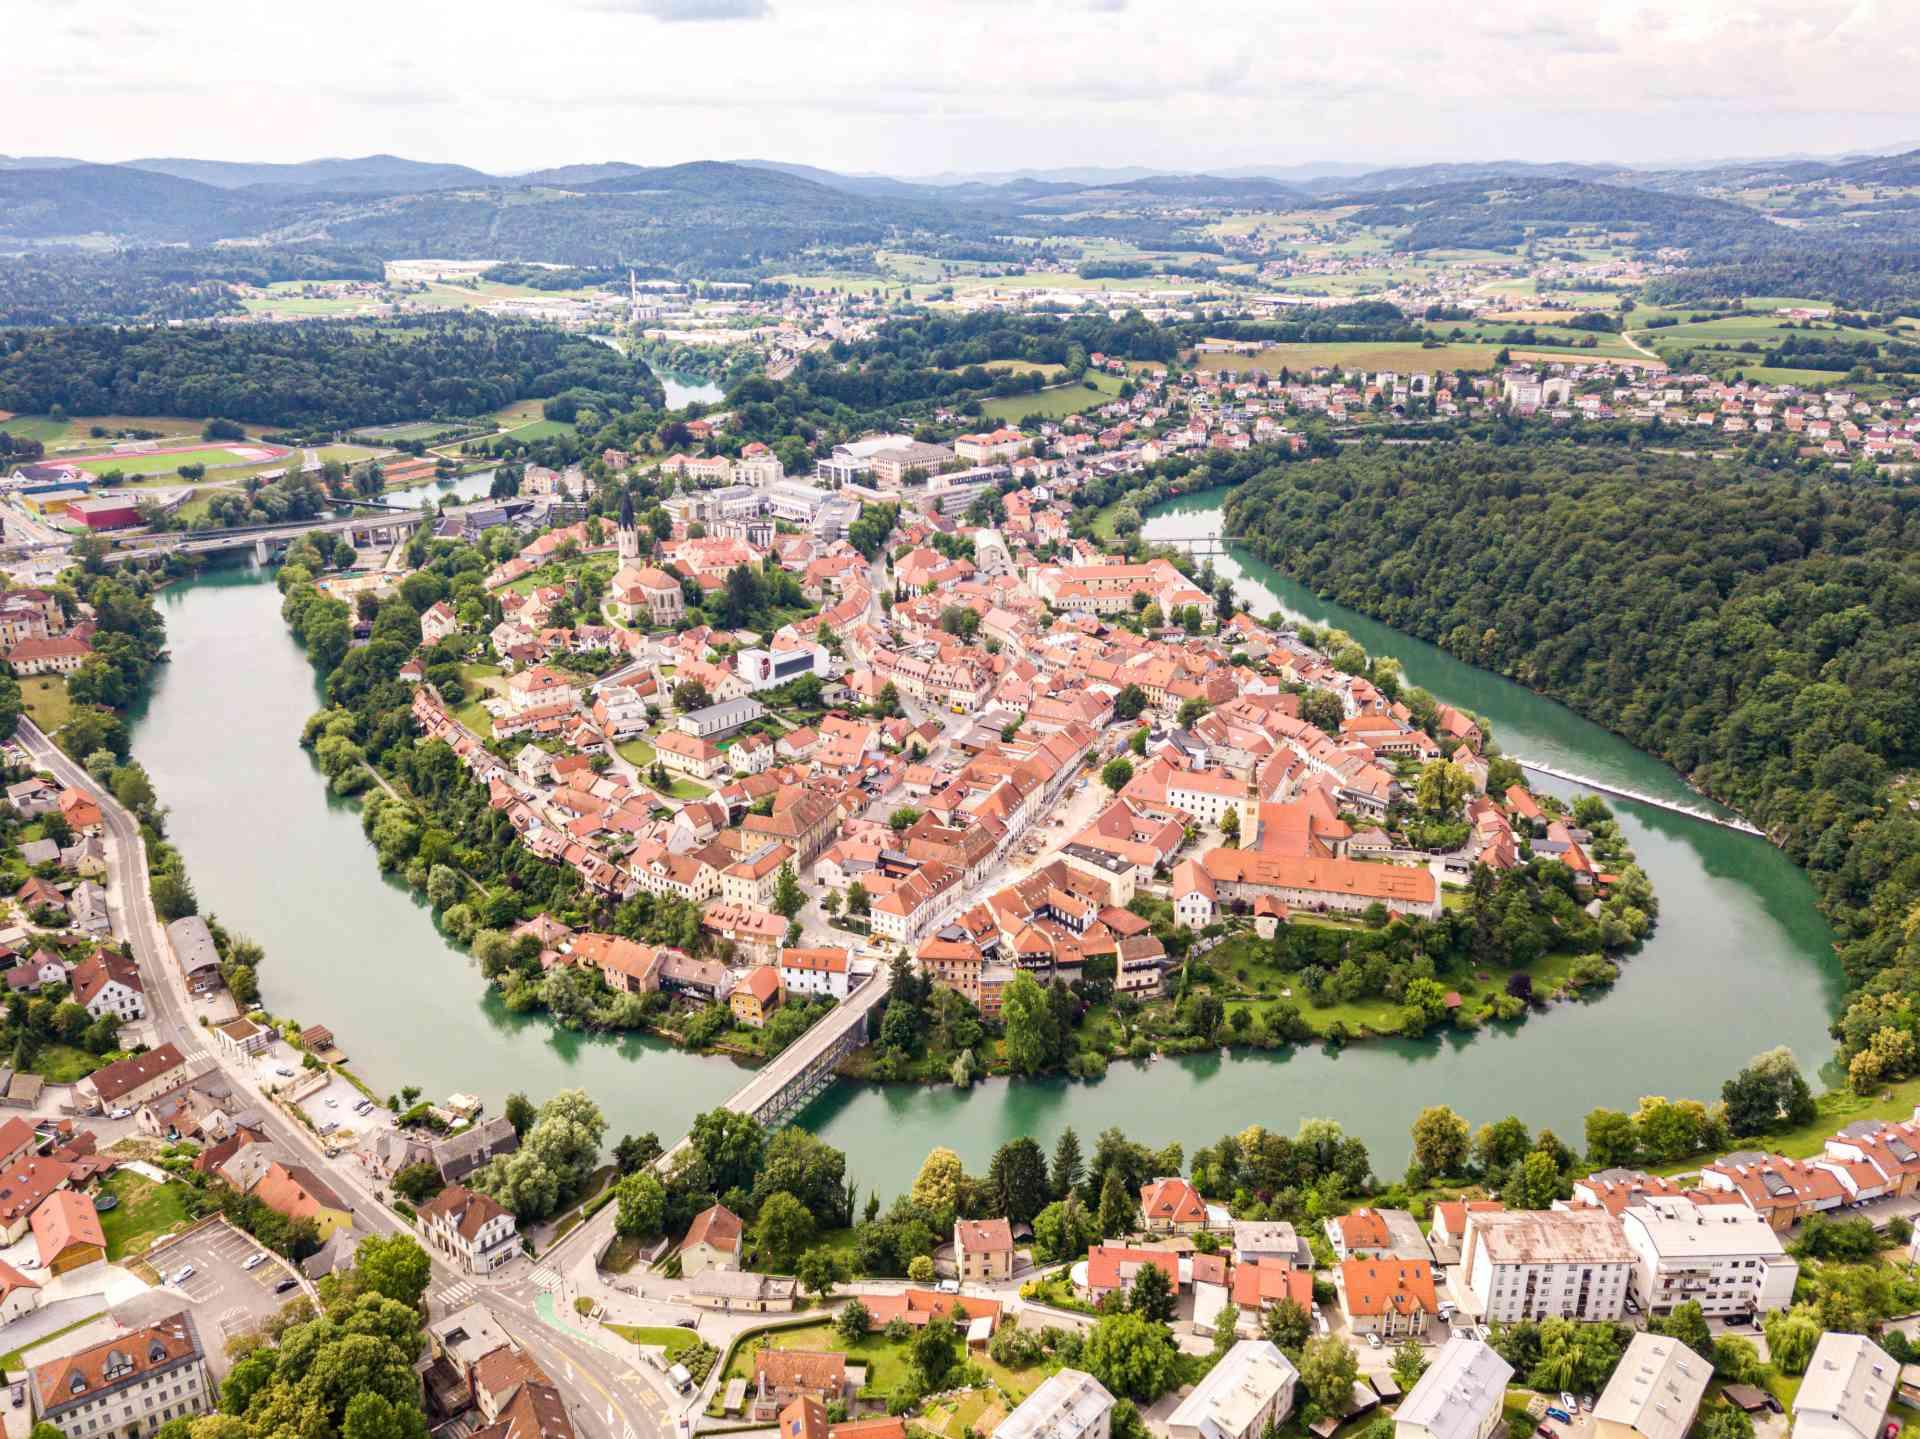 Novo Mesto, Slovenia / Adobe Stock